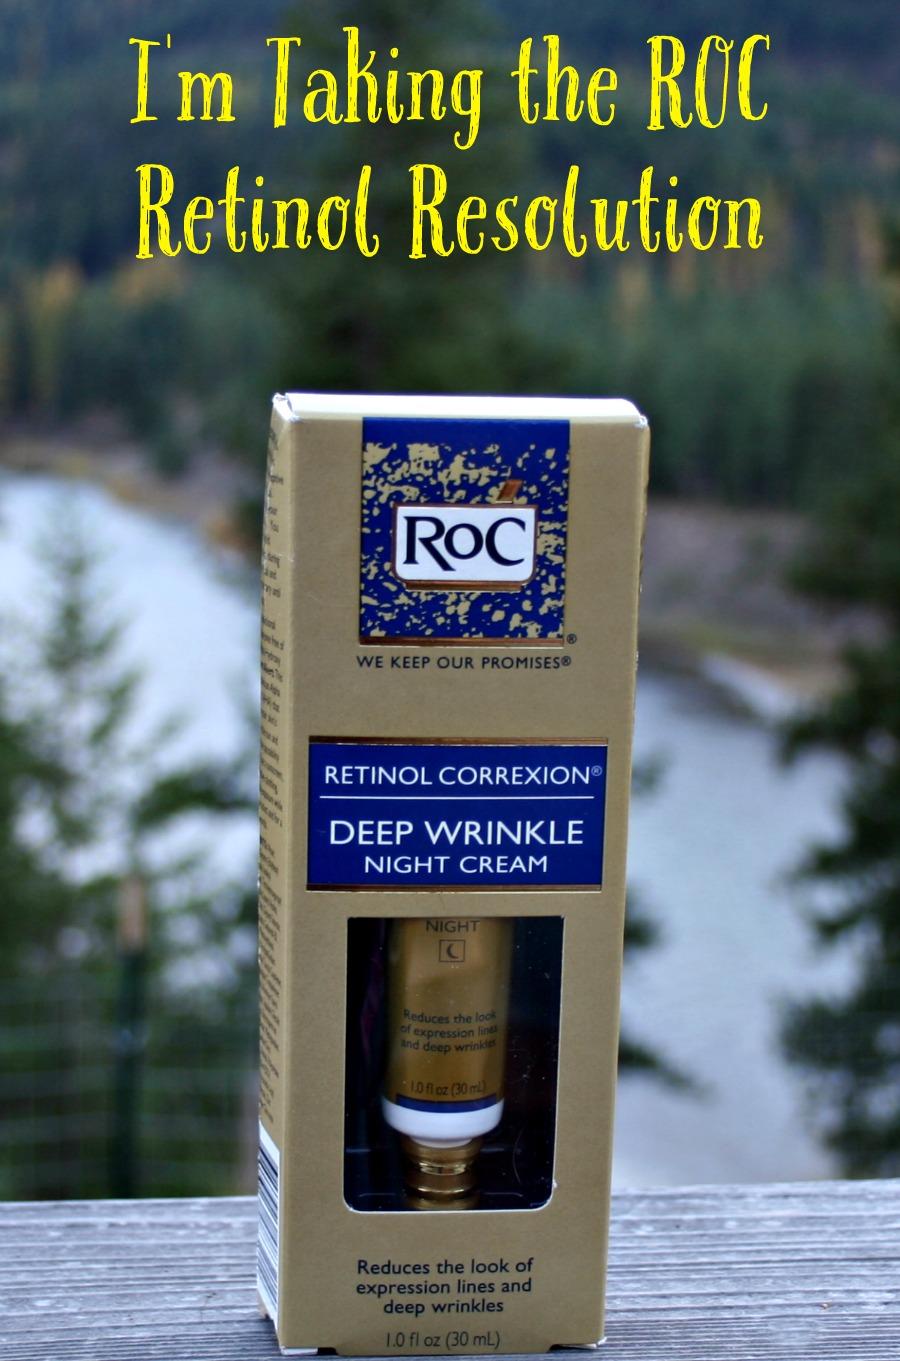 I'm Taking the RoC Retinol Resolution